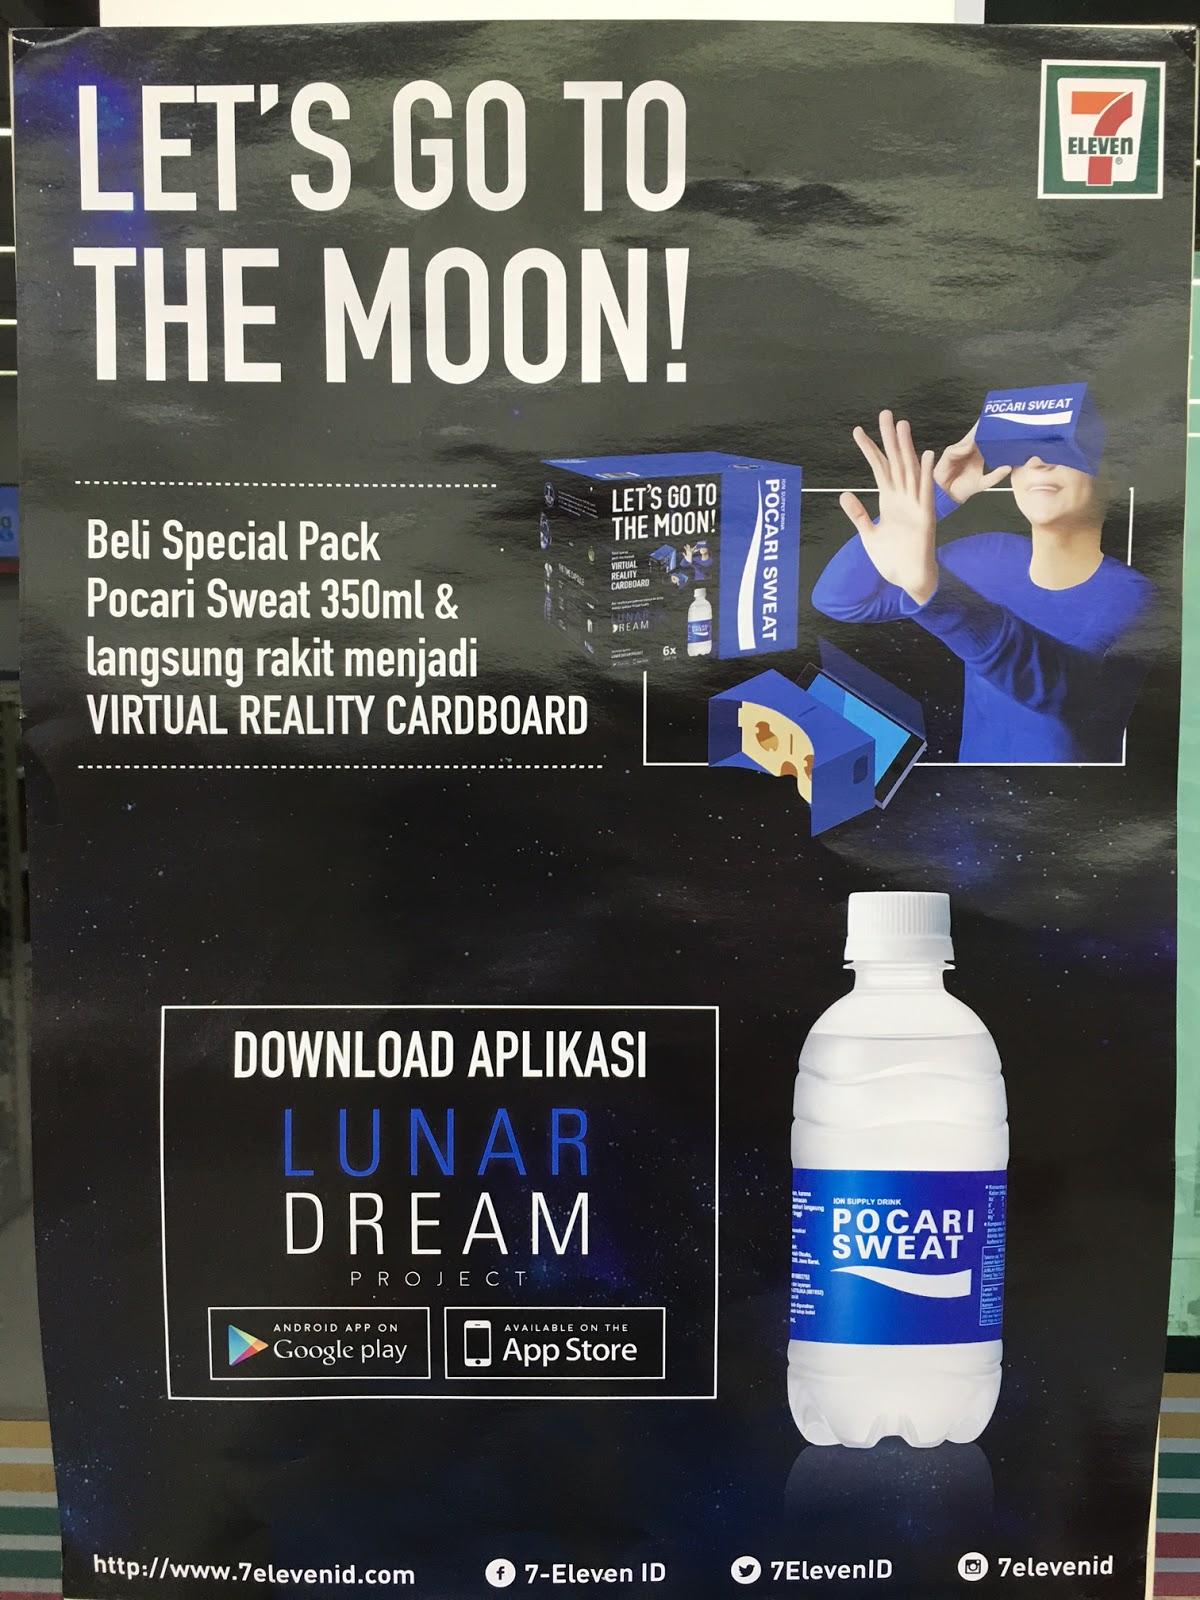 Blog Indonesia Page 4066 Of 4068 Tcash Vaganza 34 Monalisa Sarung Bantal Guling Motif Cars Lunar Project Proyek Bulan Maksudnya Apa Ya Apakah Ini Buat Mewujudkan Impian Om At Mahmud Yang Bikin Lagu Ambilkan Bu